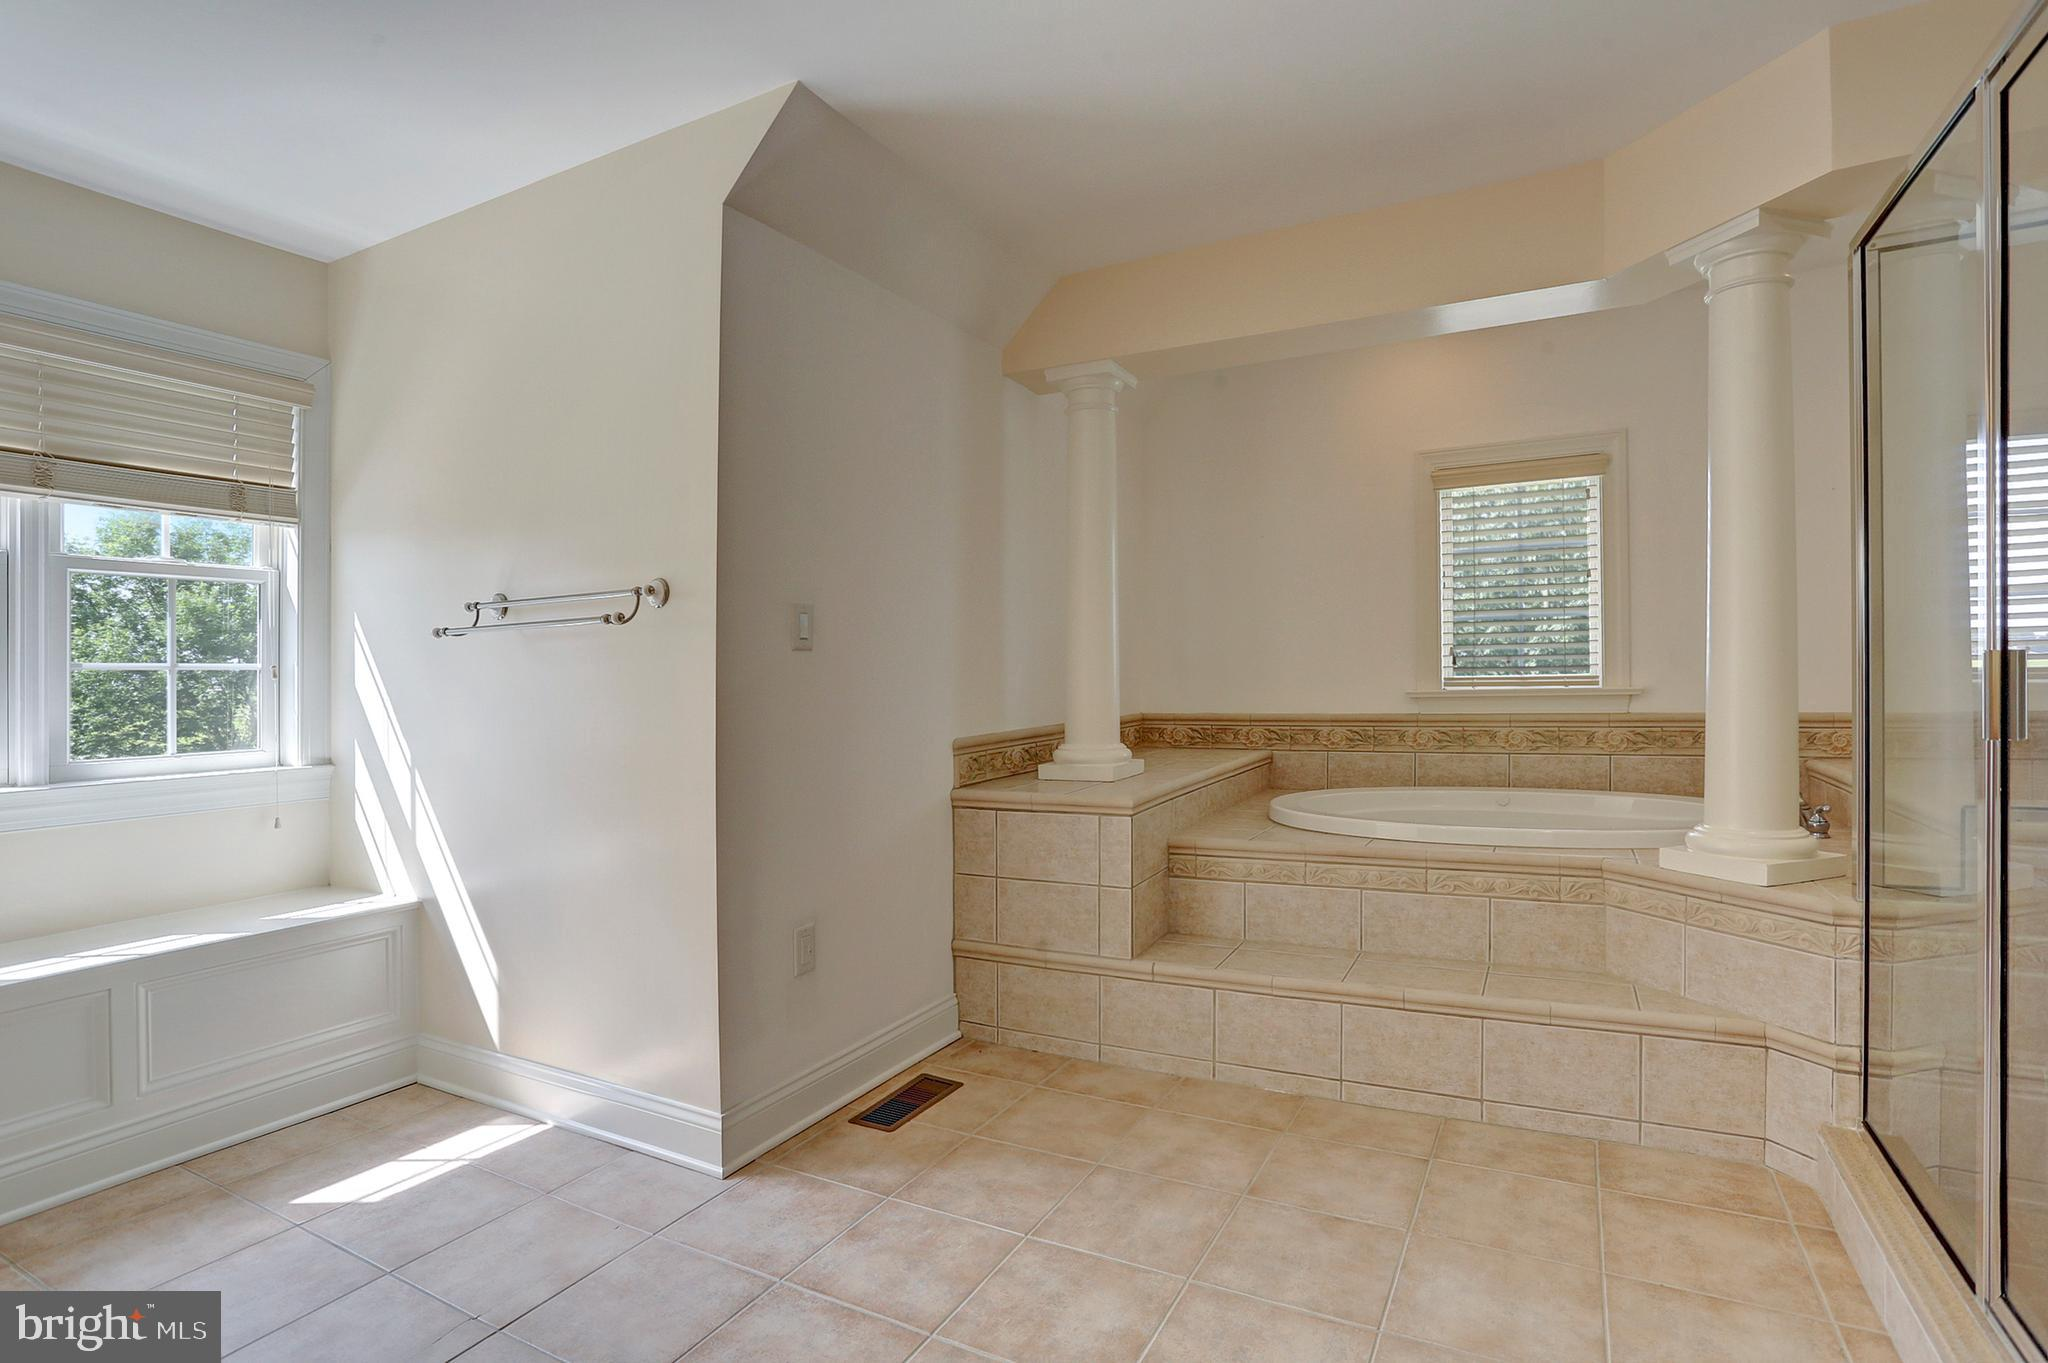 Tile Floors in the Master Bathroom